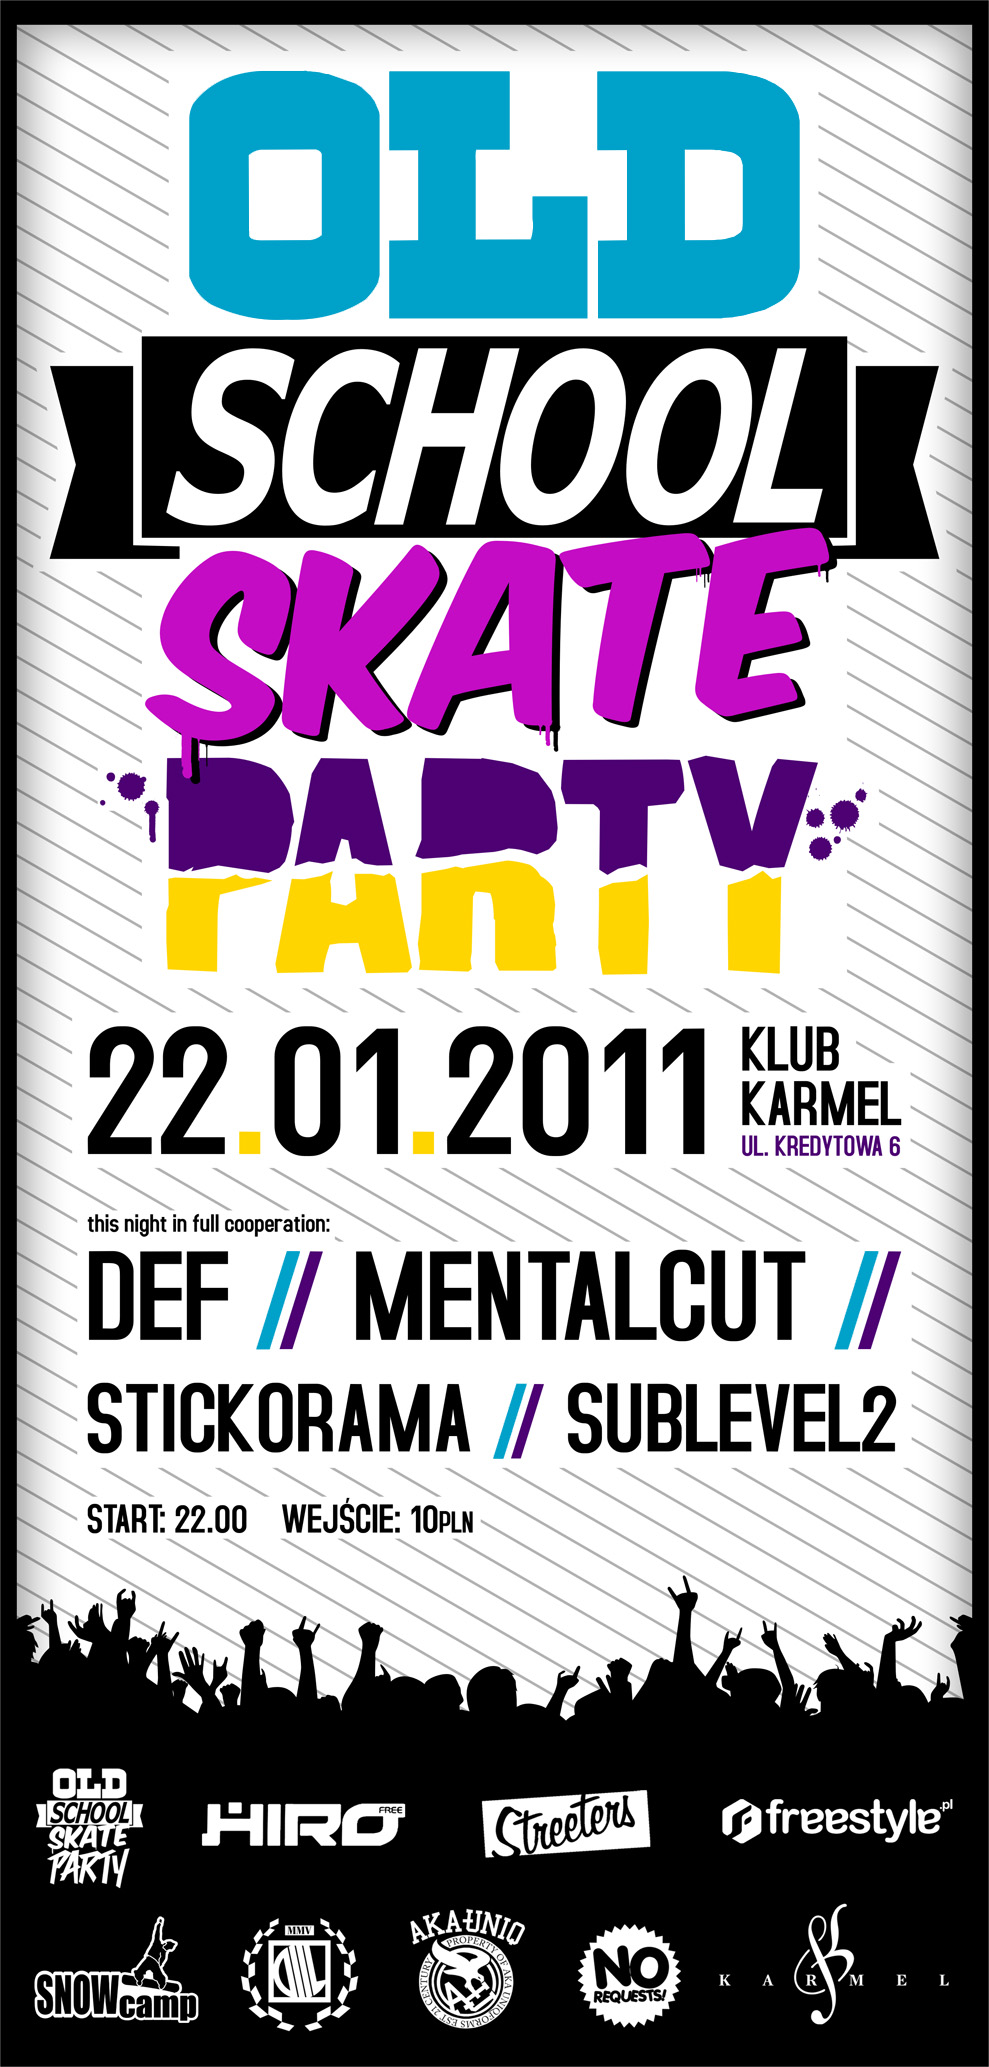 22.01 |Old School Skate Party | Mentalcut x Def x Stickorama x Sublevel2